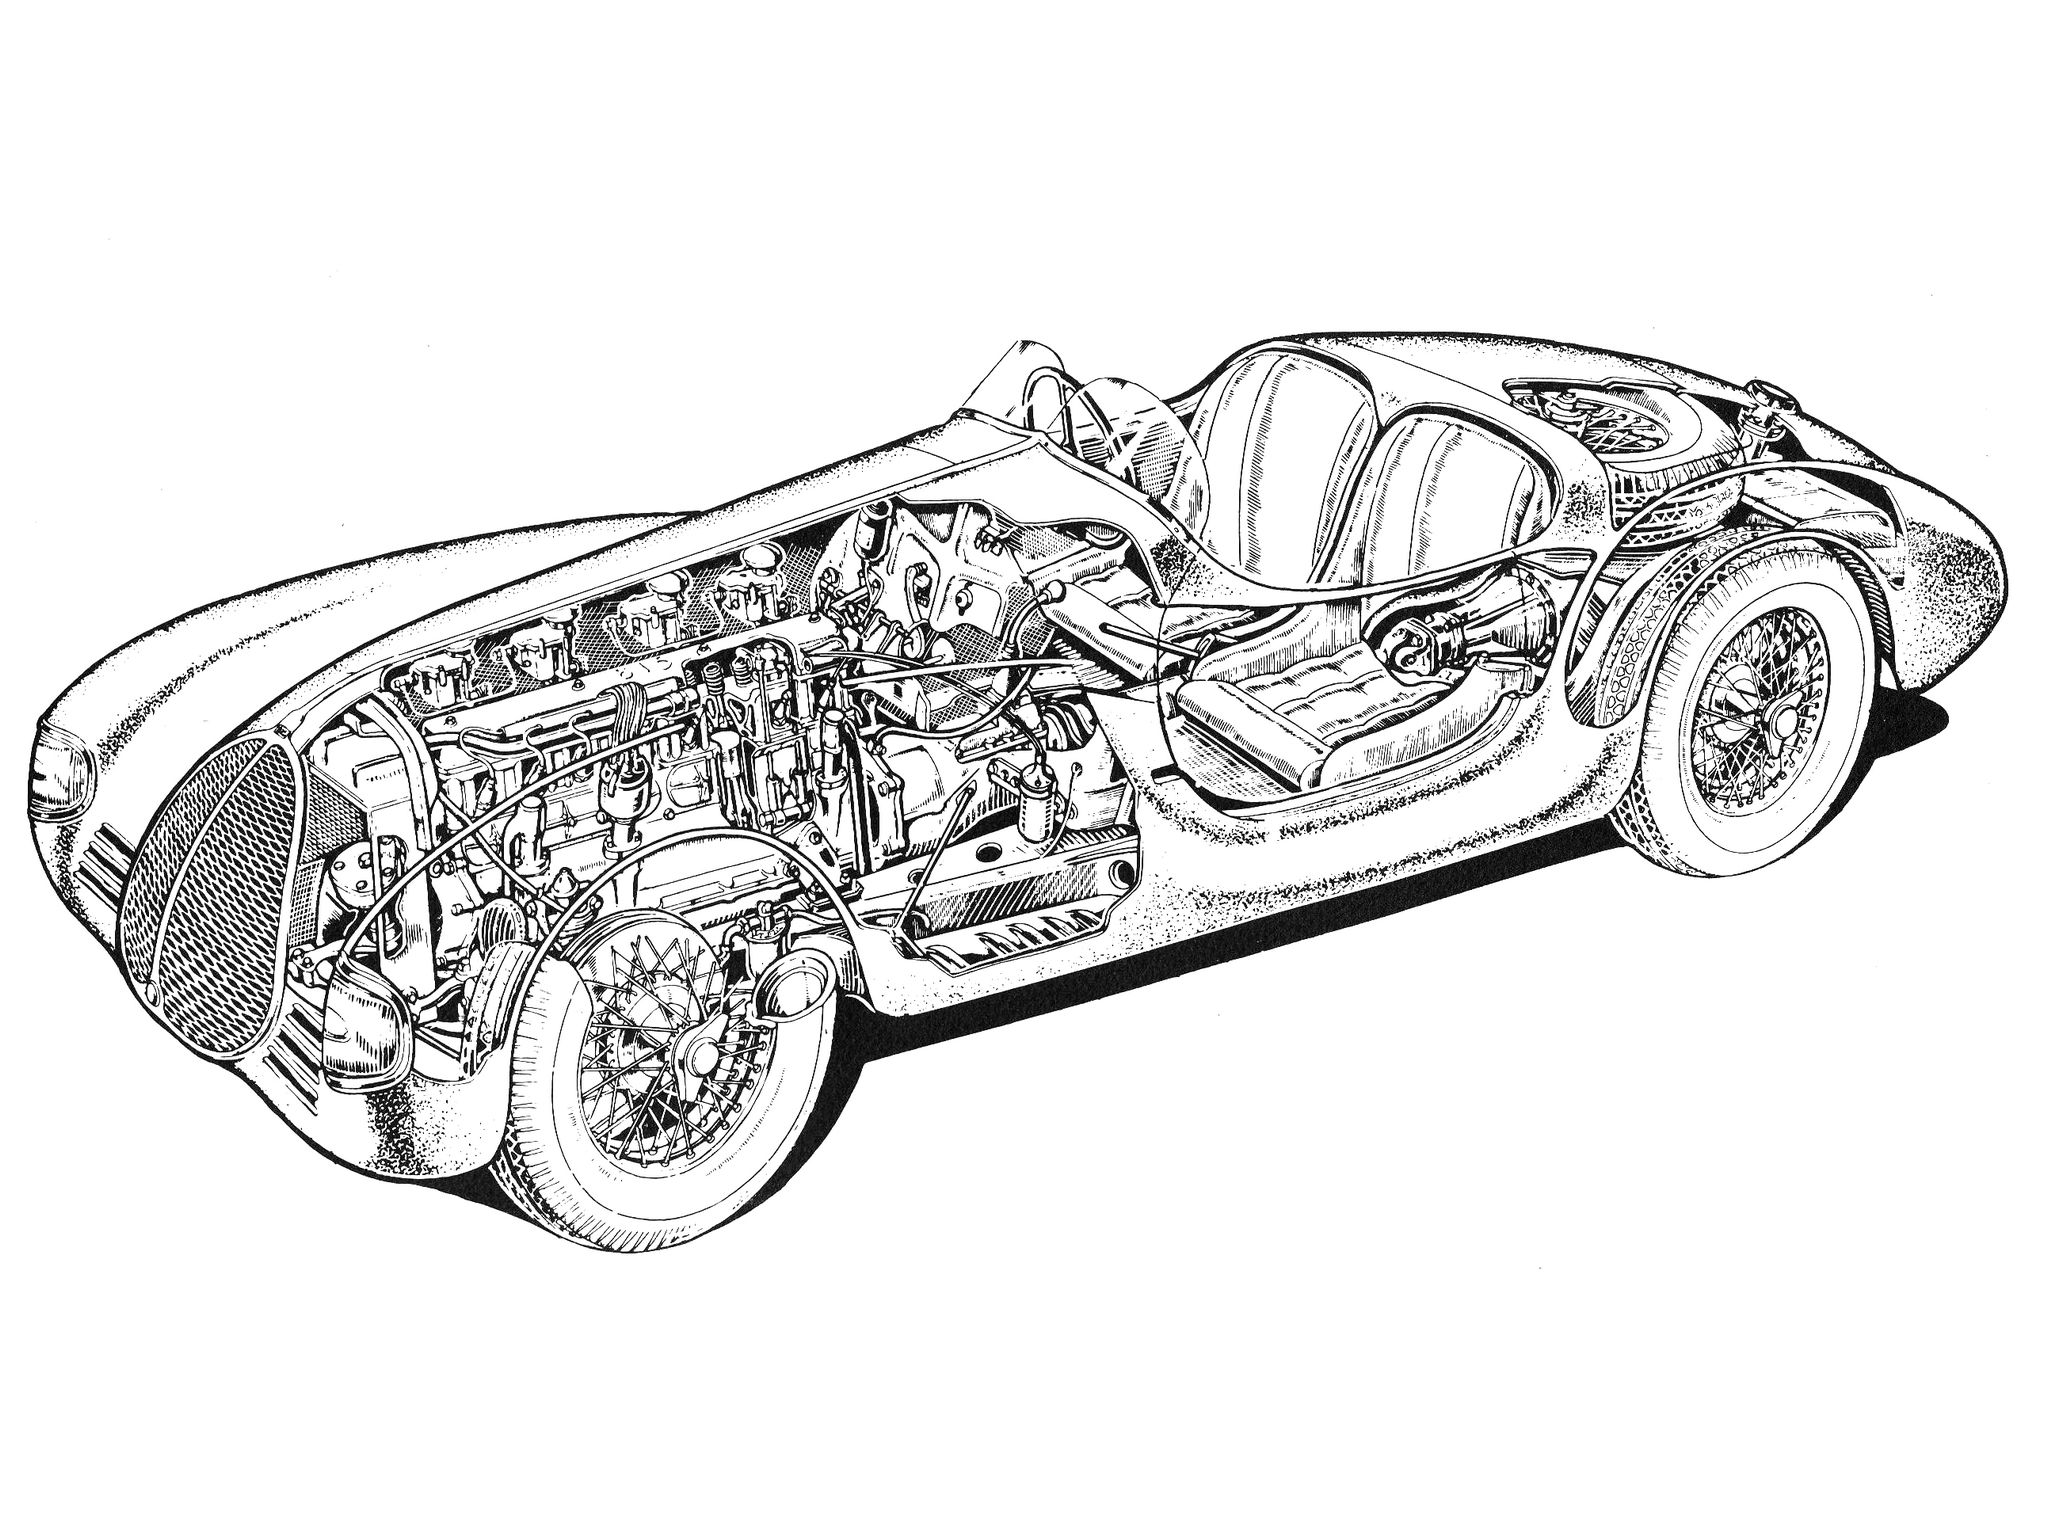 1940 aac tipo 815 illustration credited to giovanni caravara 1965 Ford GT40 1940 aac tipo 815 illustration credited to giovanni caravara